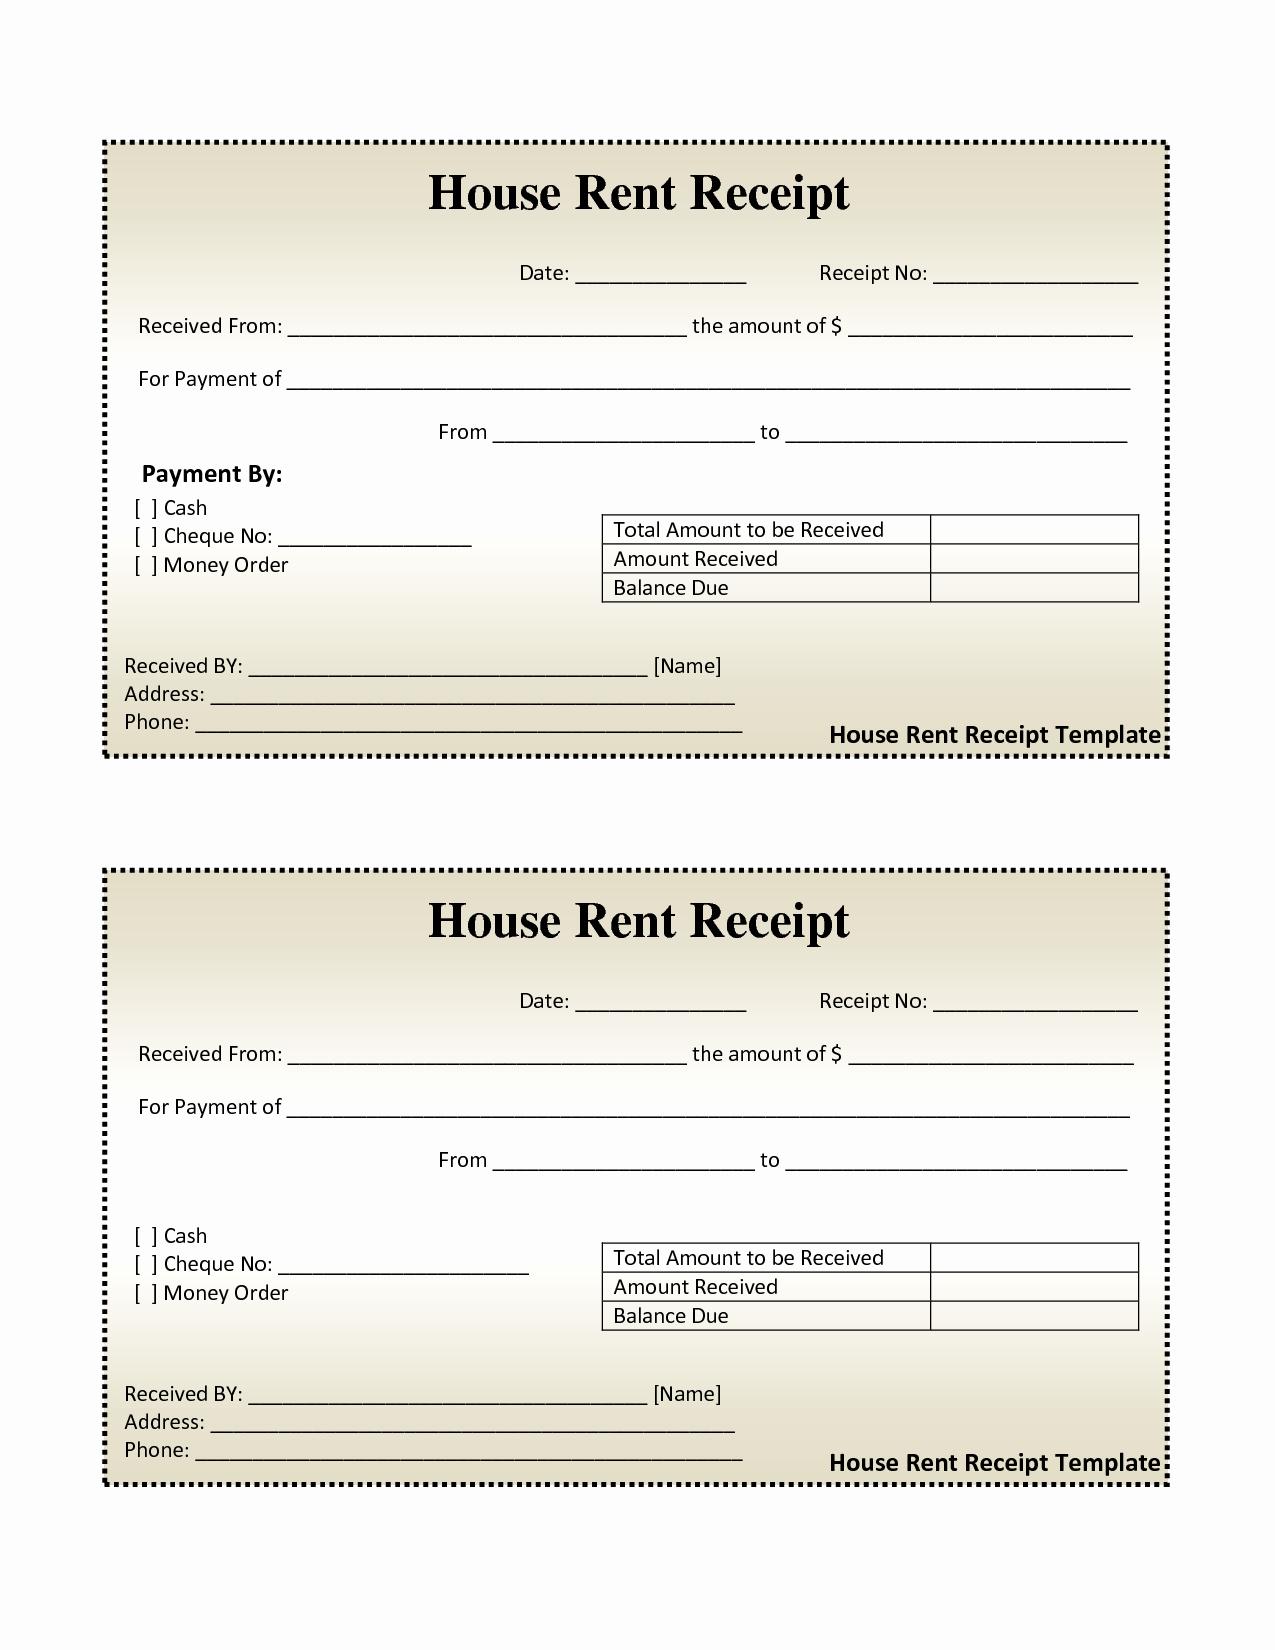 Rent Invoice Template Free Luxury Free House Rental Invoice